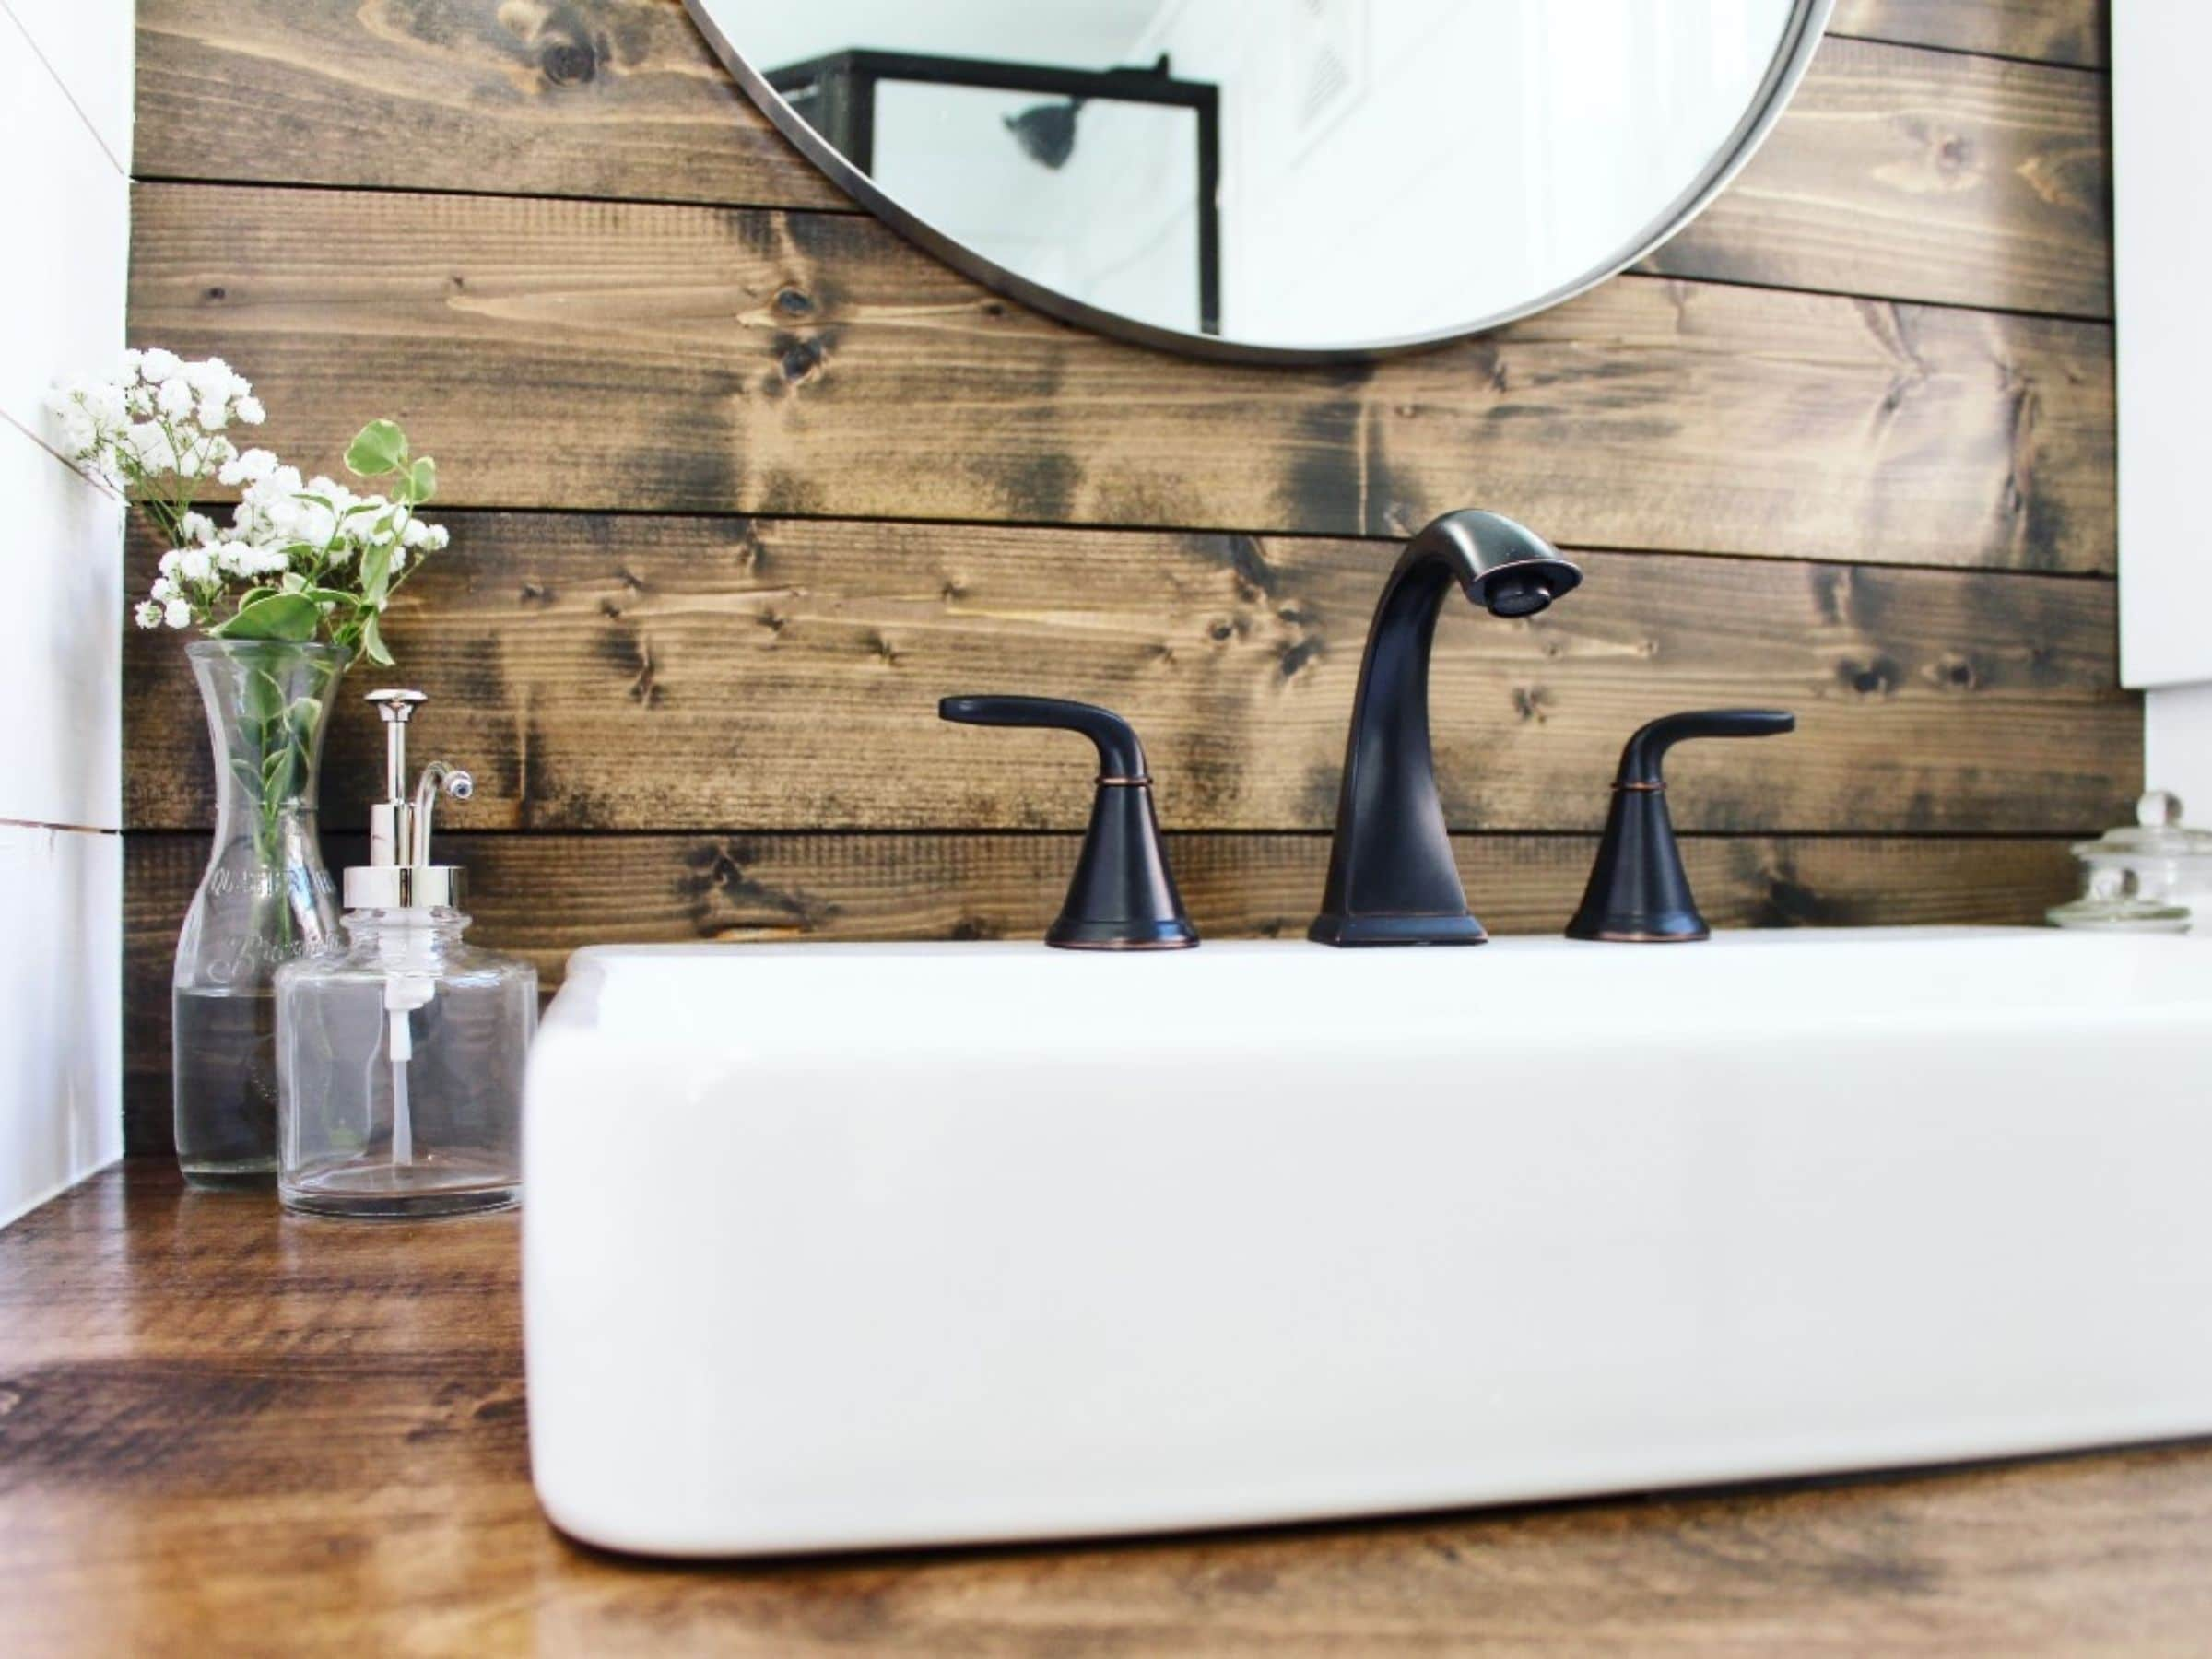 Wood backsplash behind tall white sink with black matte faucet